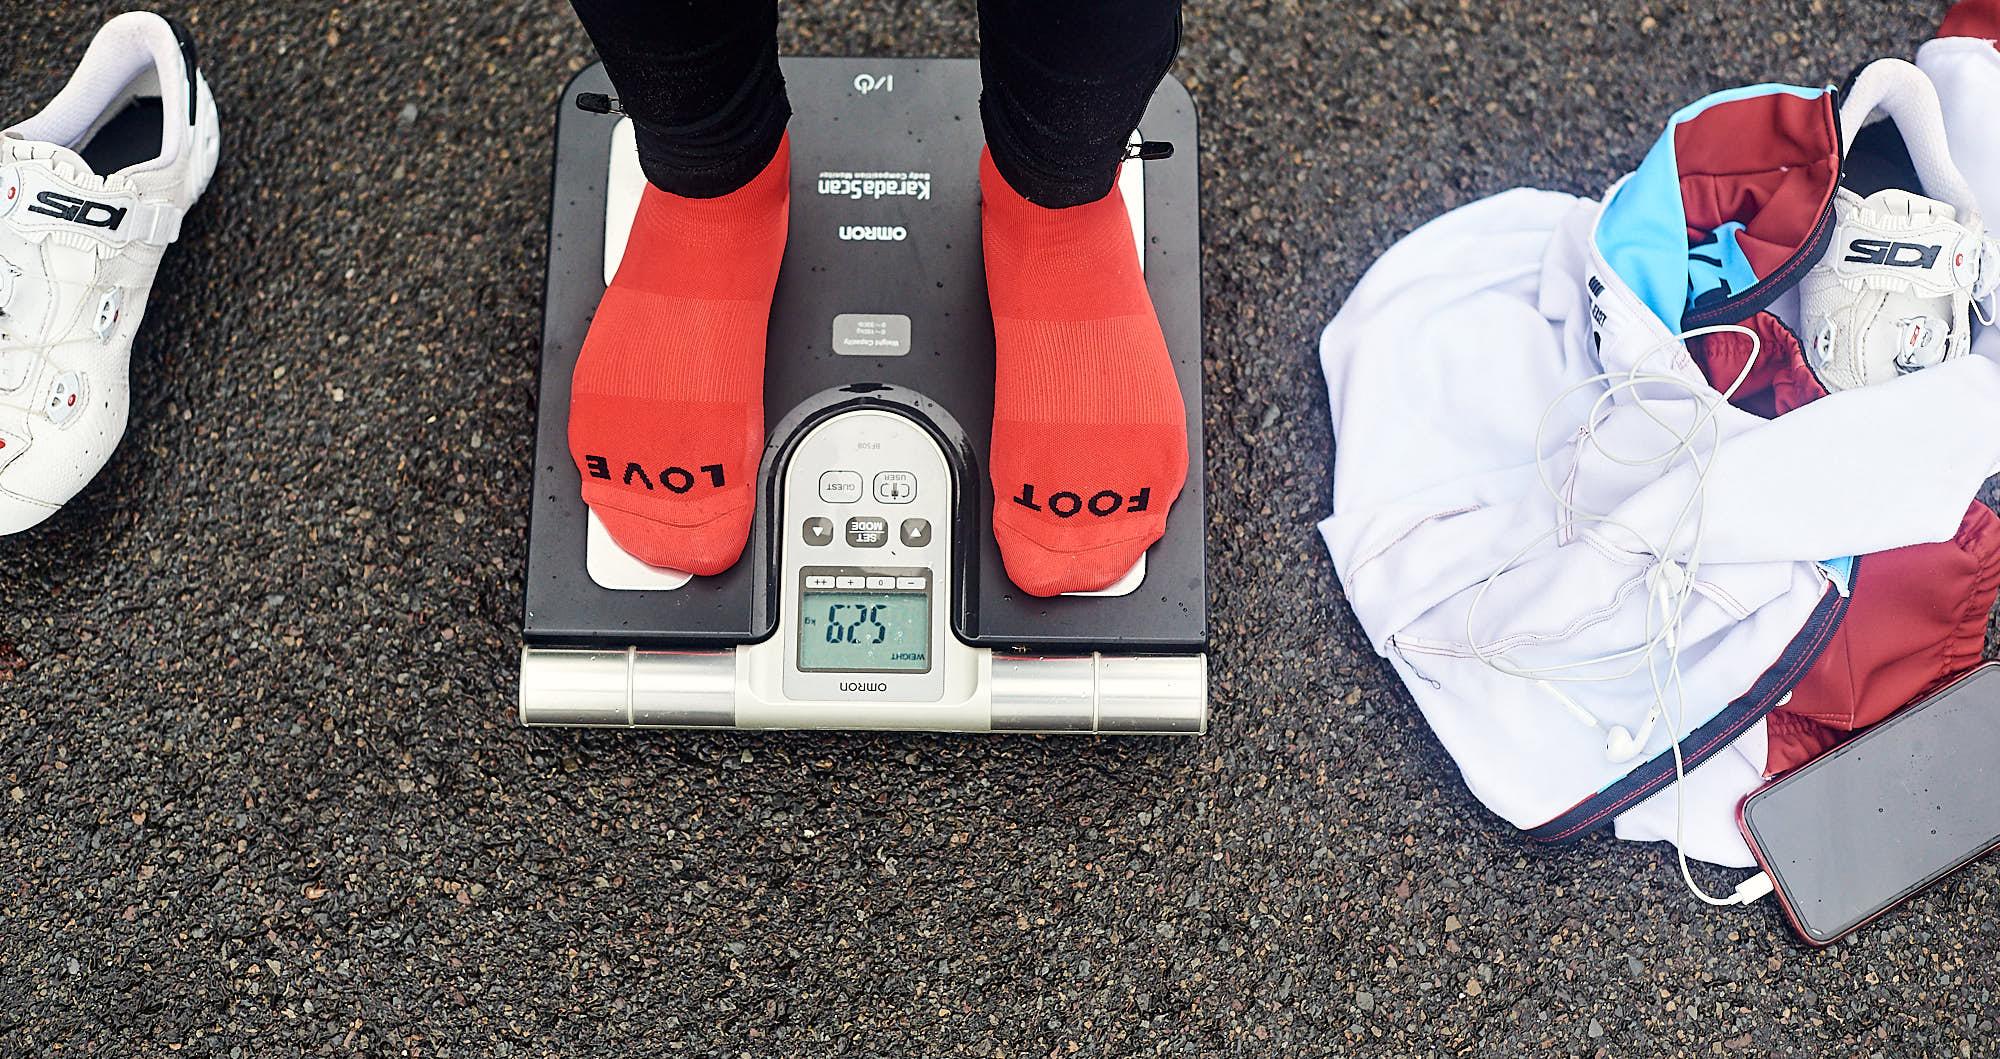 Cyclist's feet on a scale